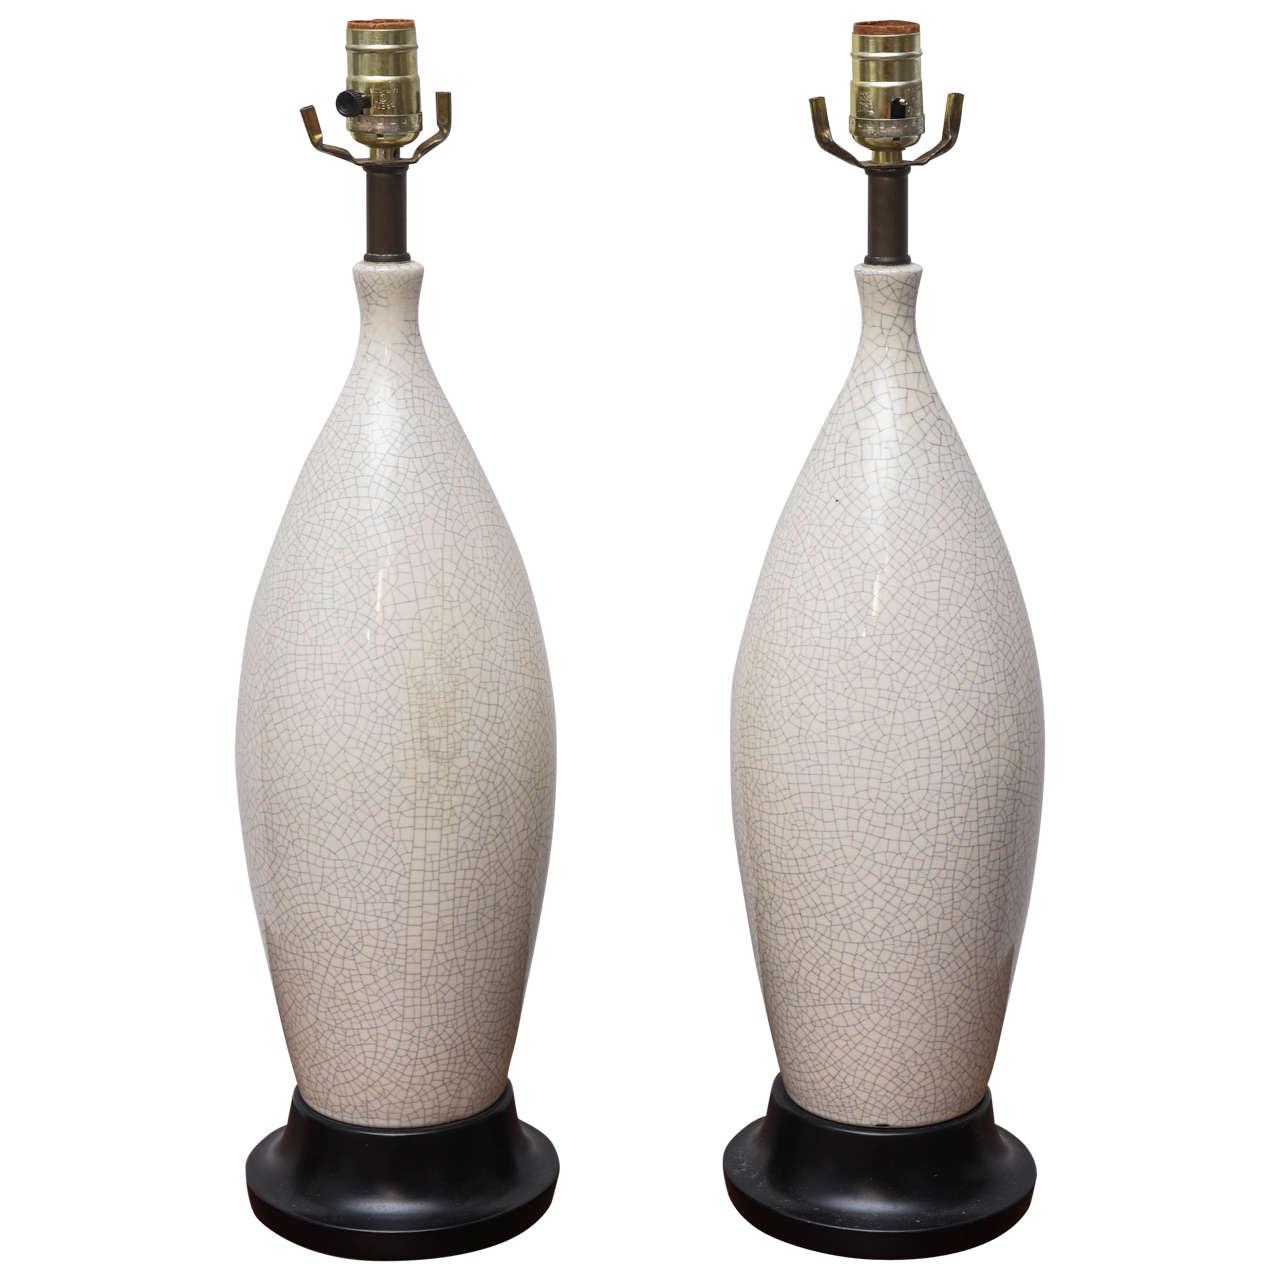 Pair of MCM Crackle Glazed Ceramic Lamps, USA 1960s